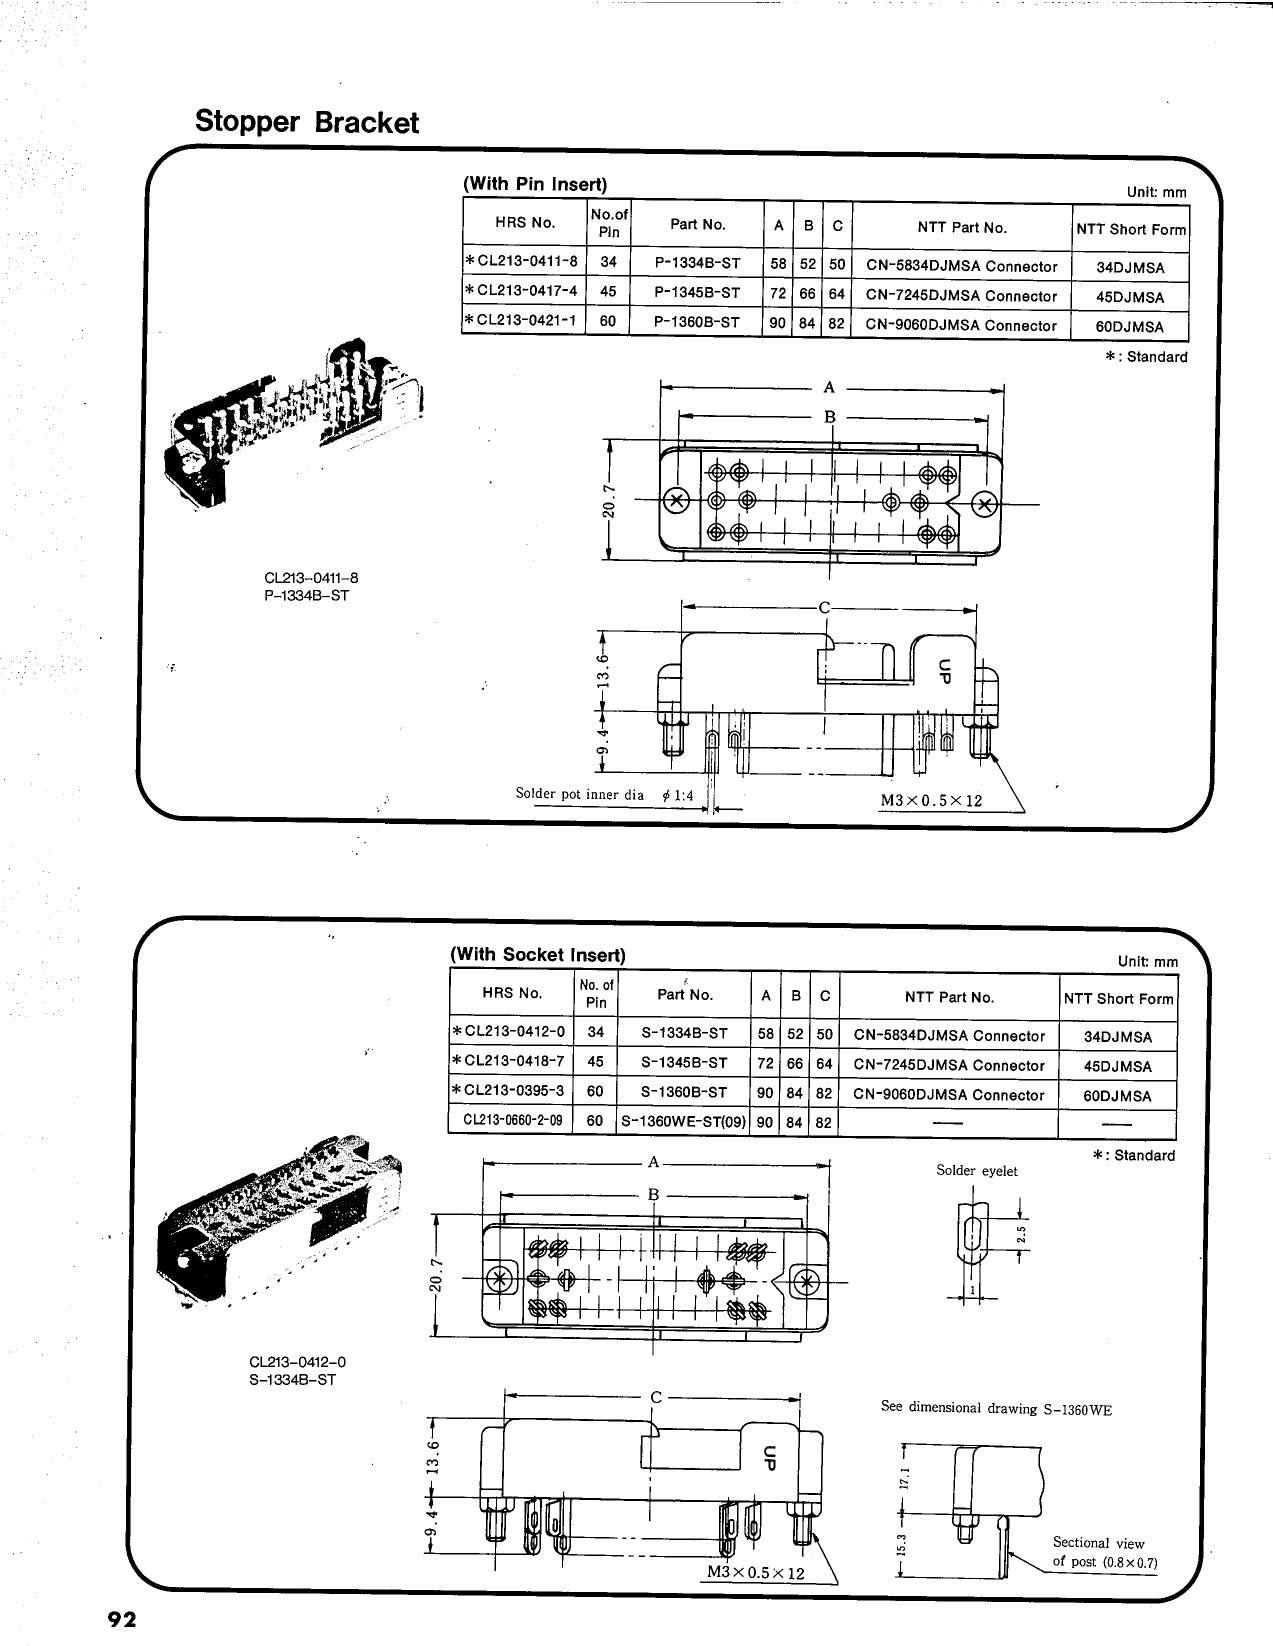 P-138W-SB arduino